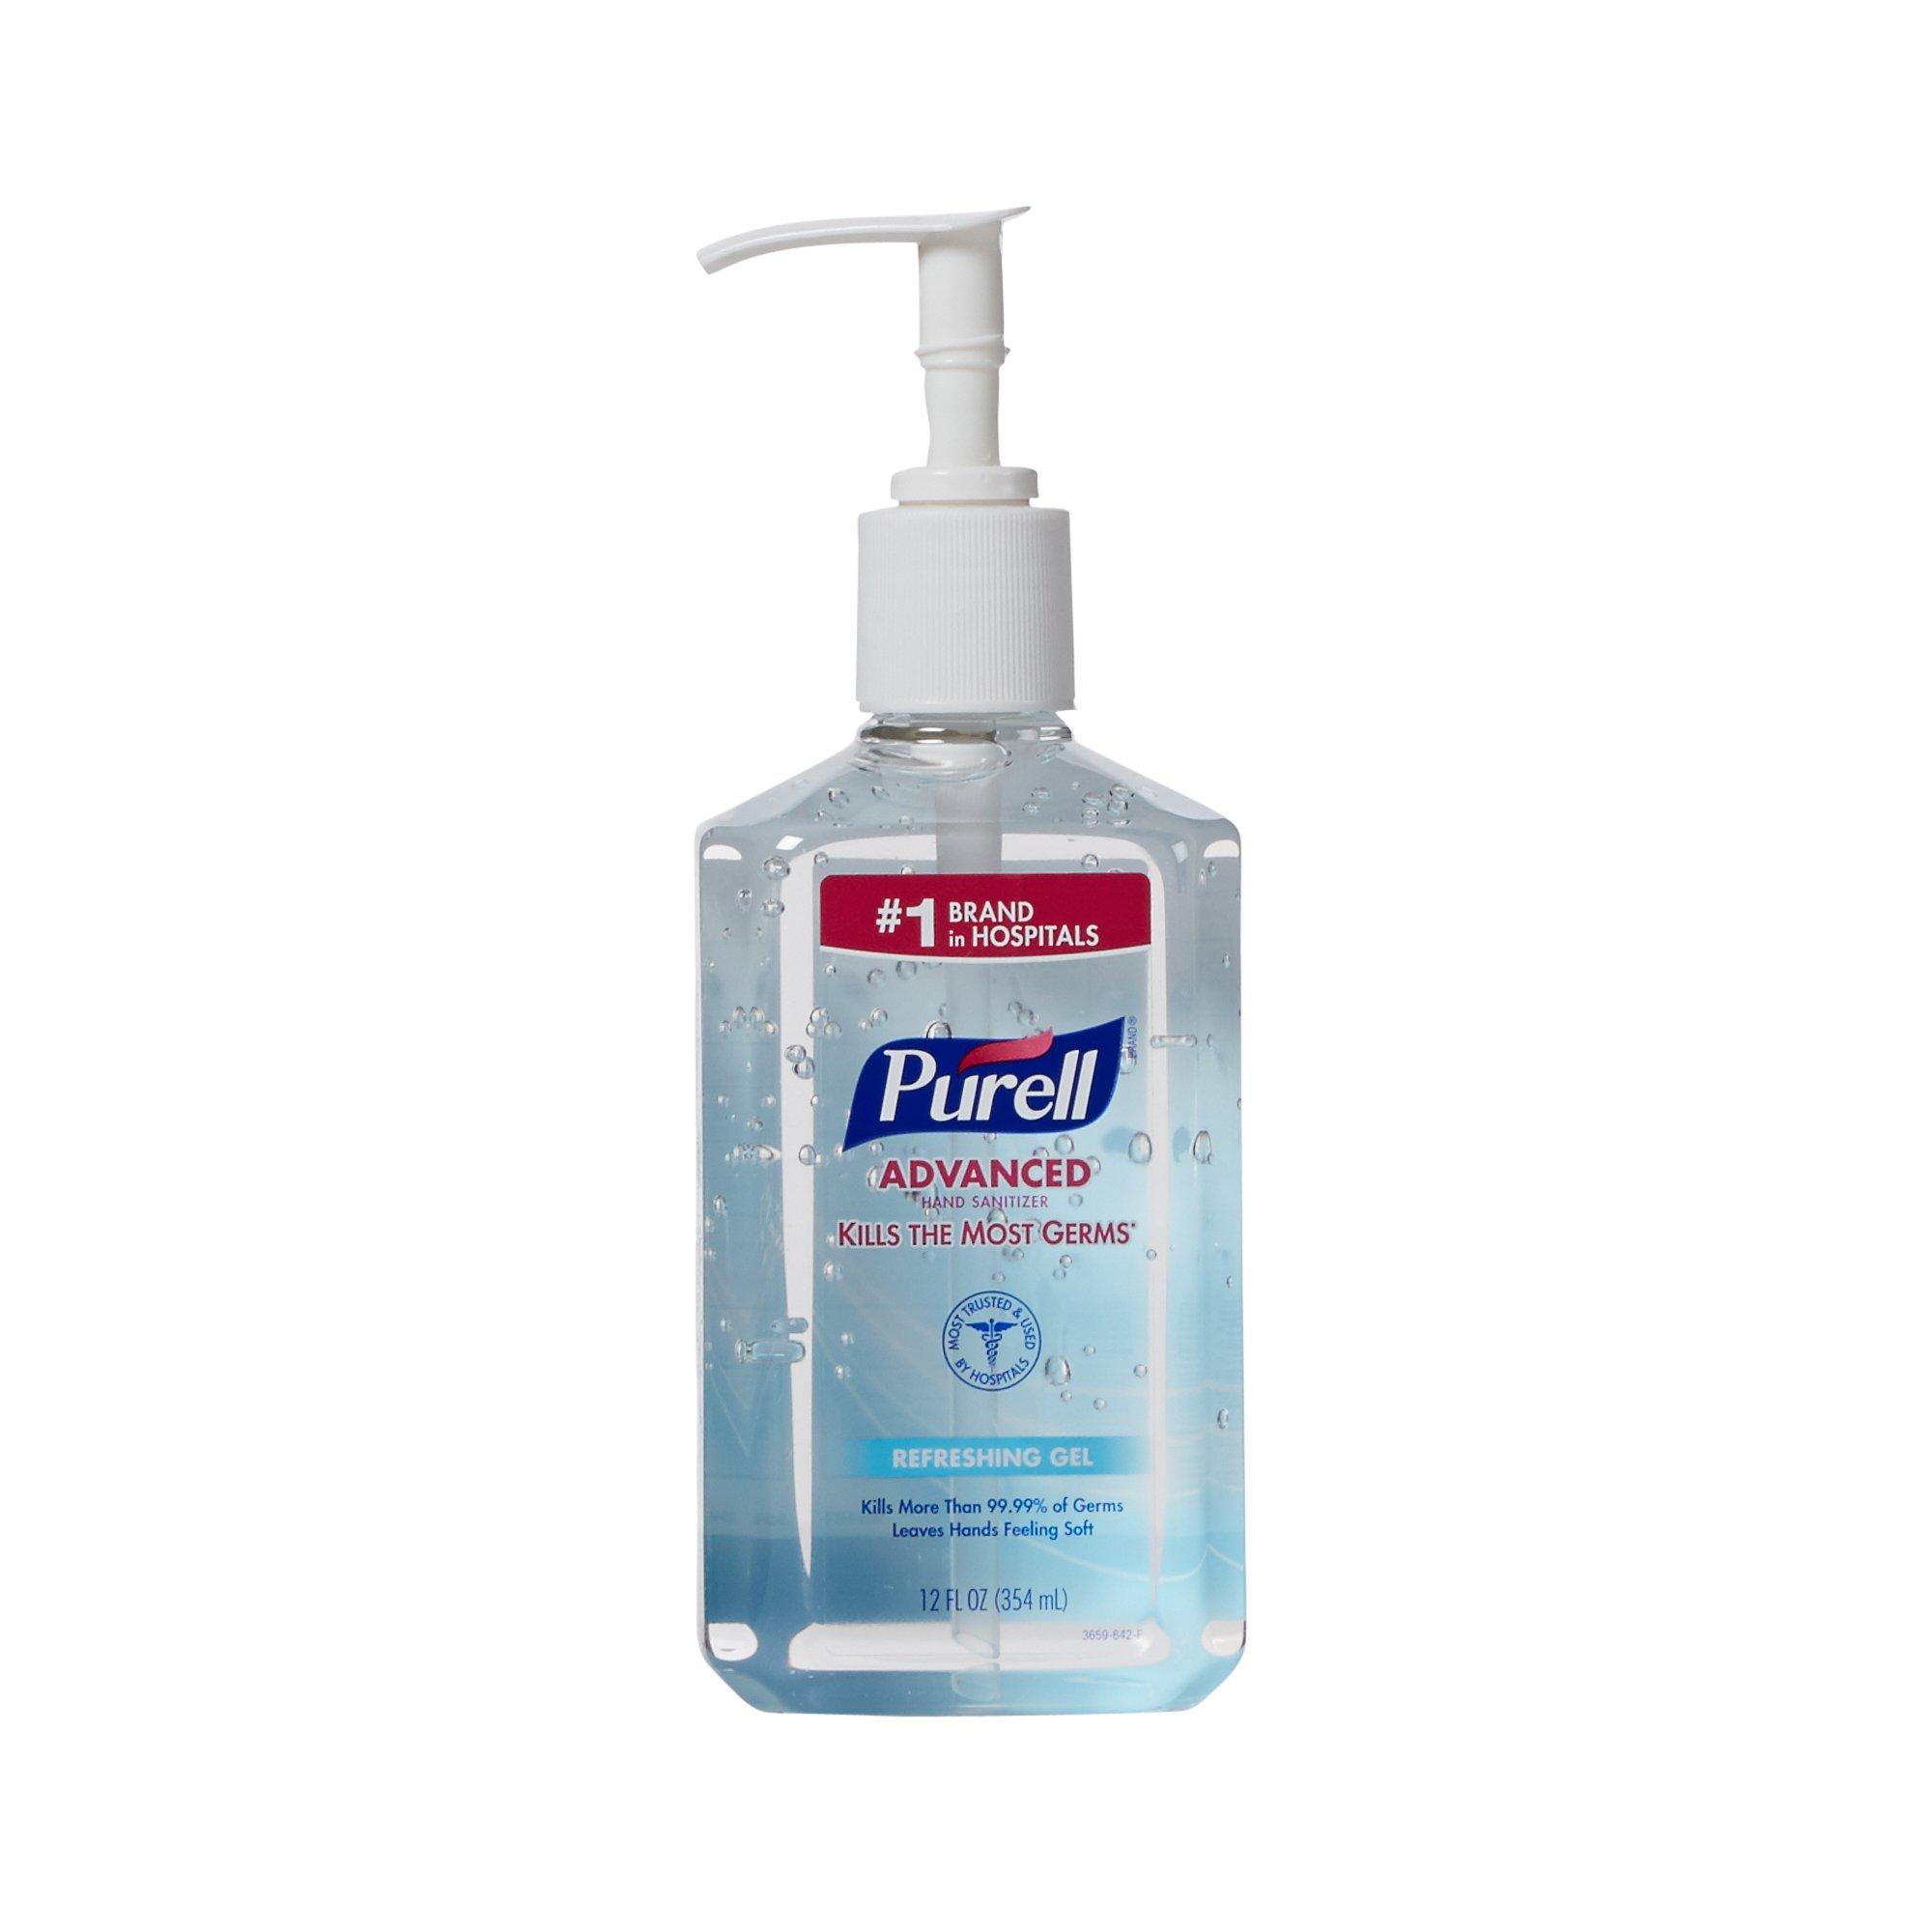 Purell Advanced Hand Sanitizer 12 oz. Ethyl Alcohol Gel Pump Bottle, 3659-12 - EACH